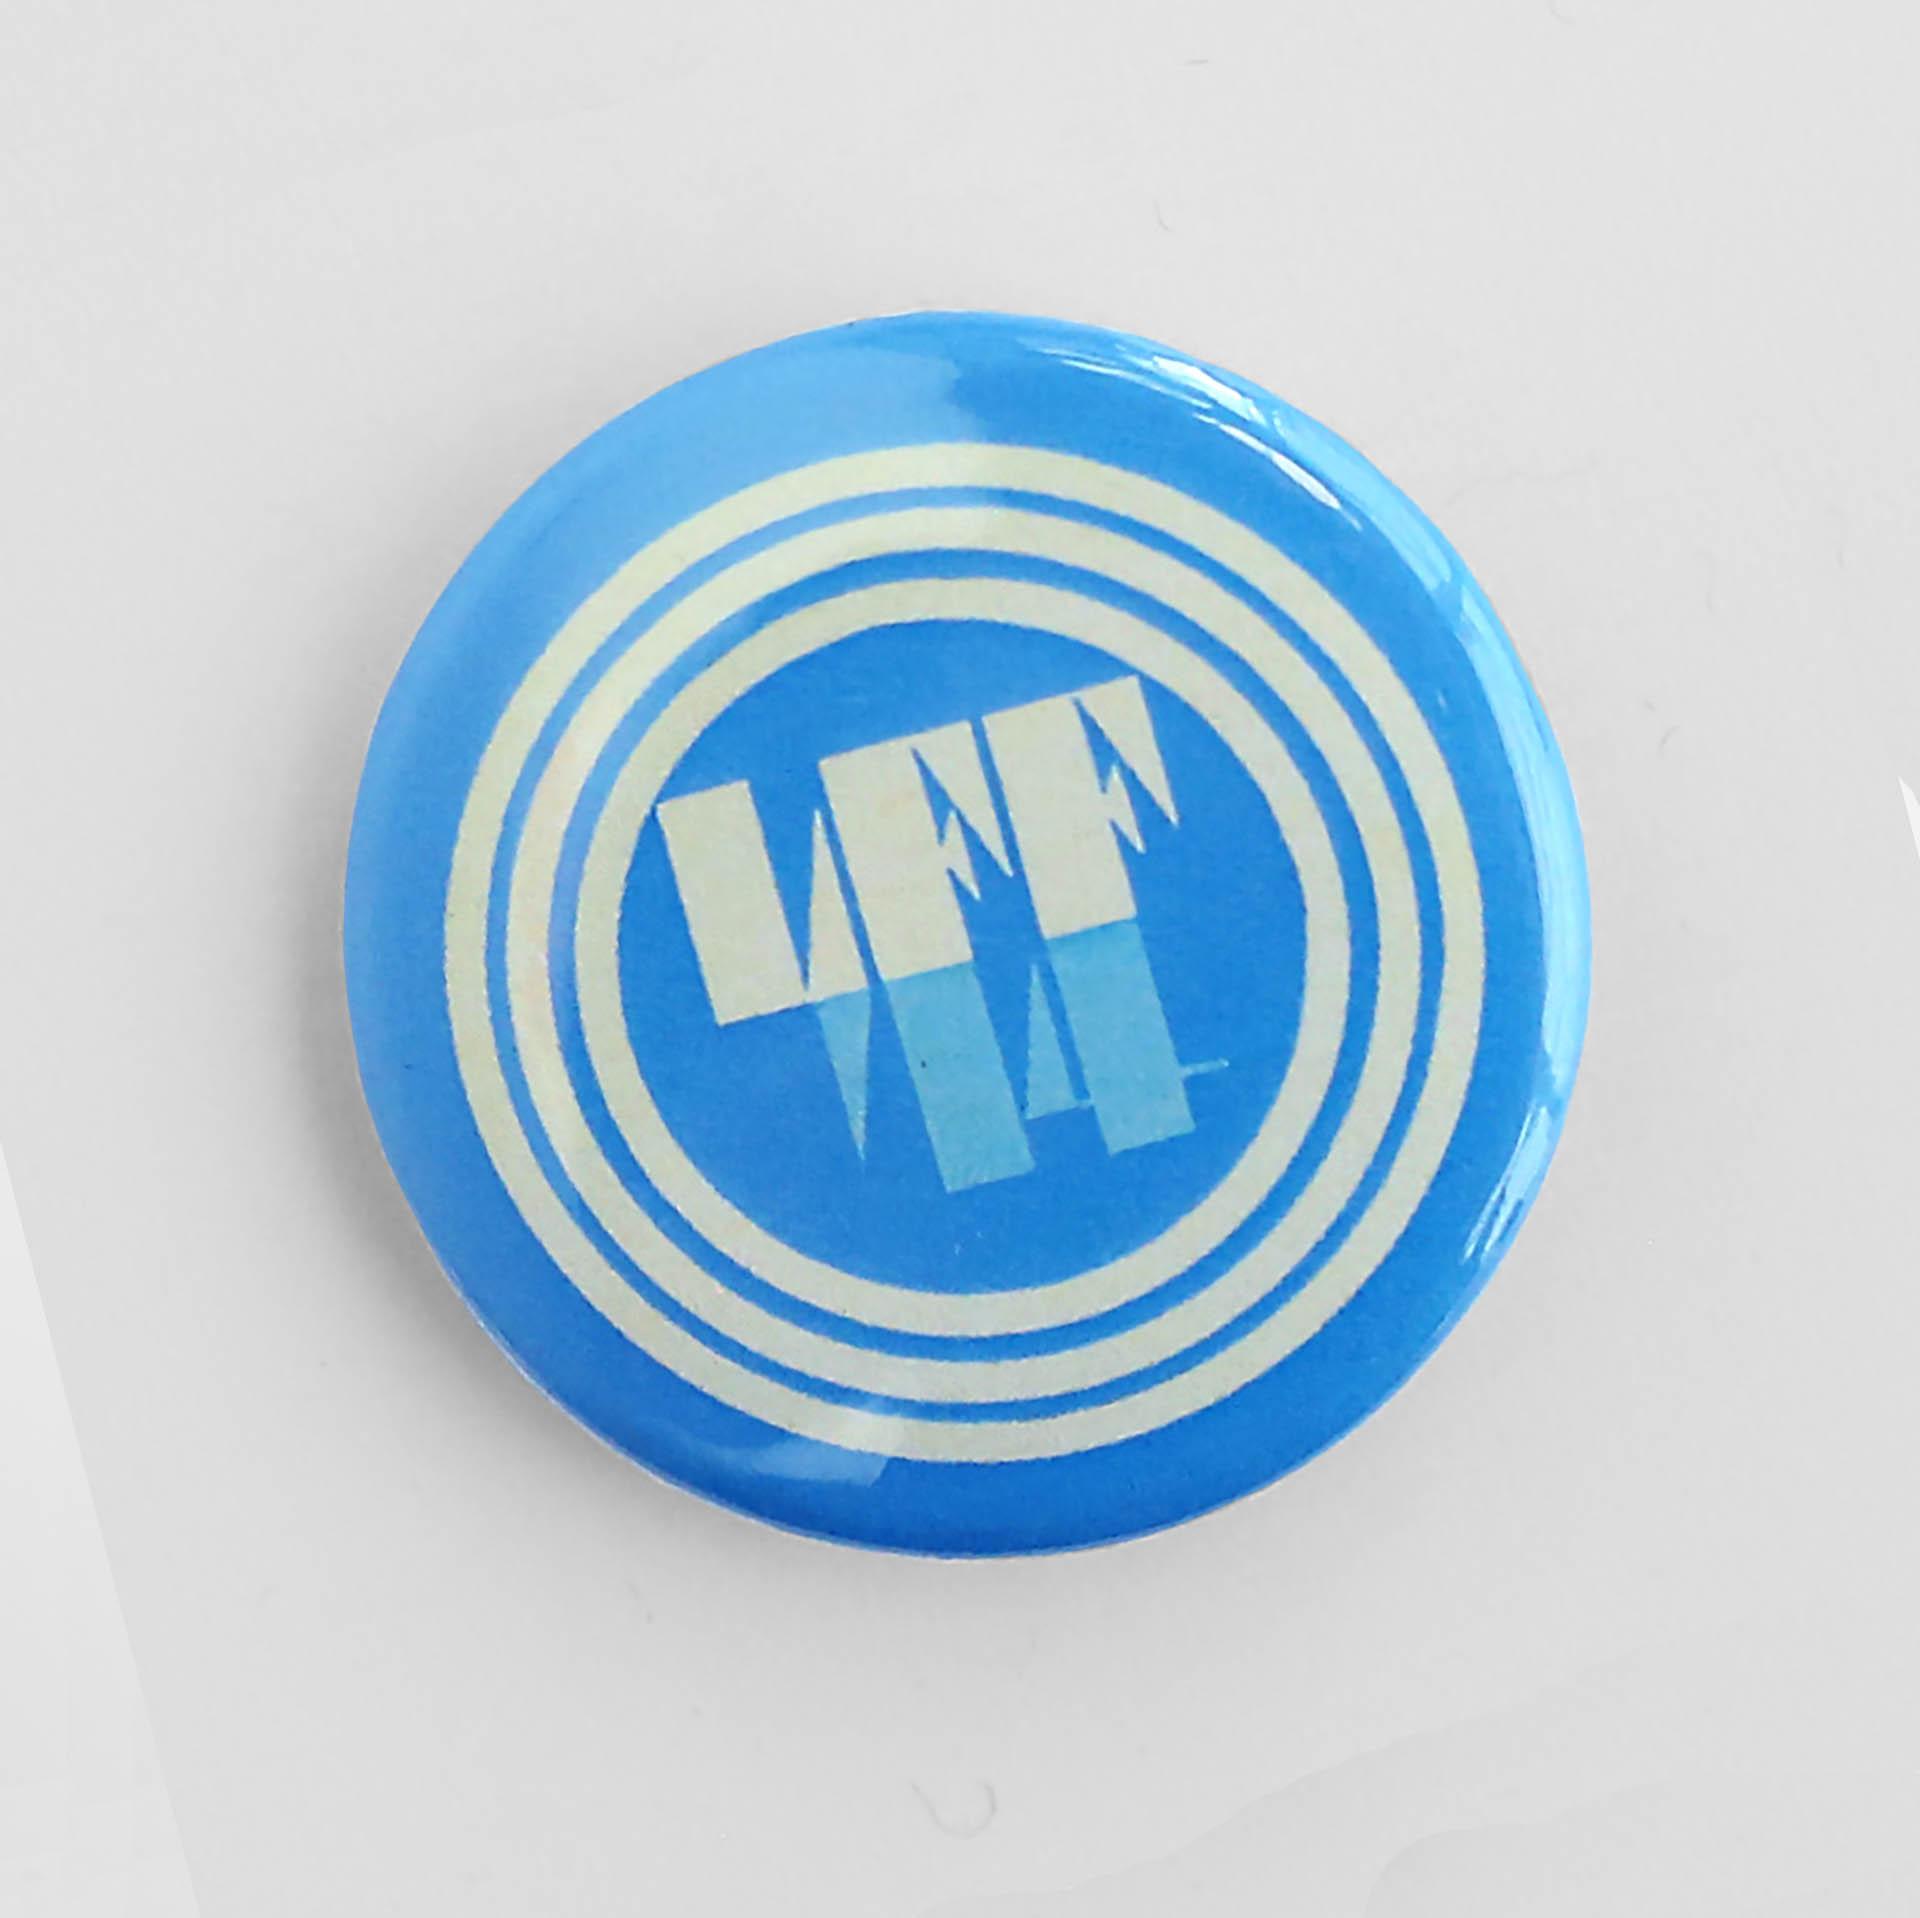 Buy London Film Festival Archive Pin Badge Set